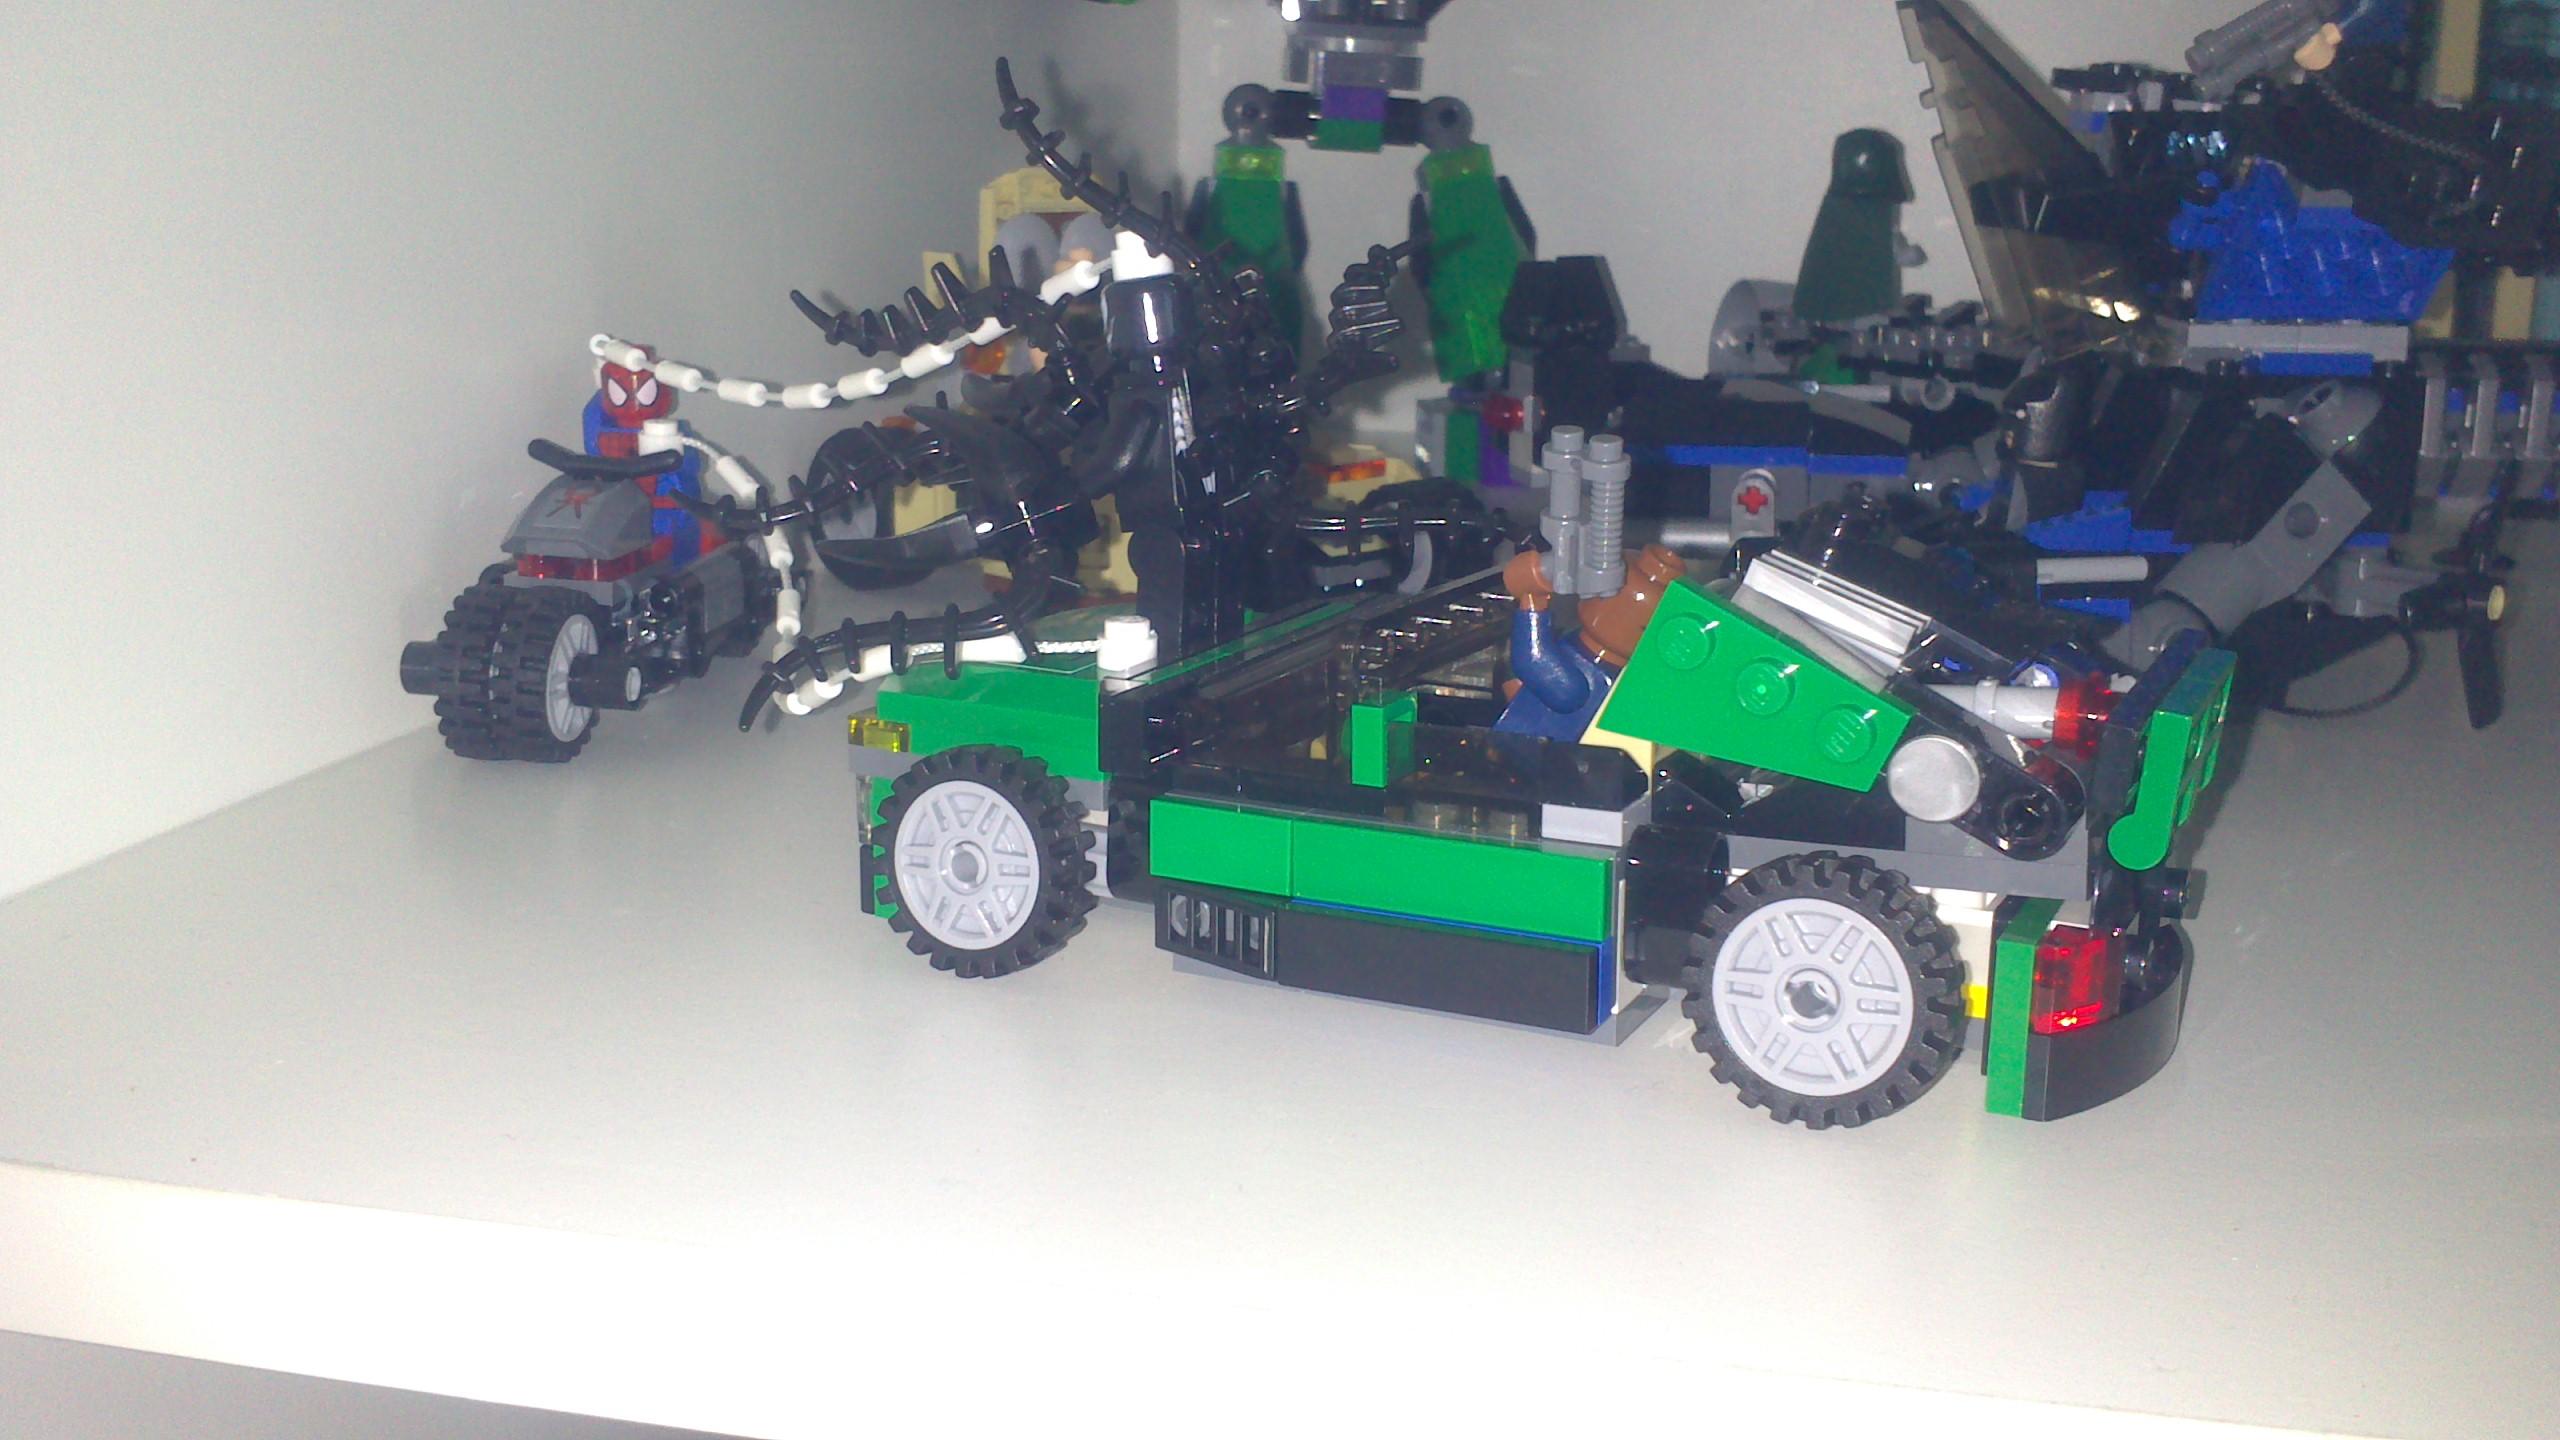 Consejos montaje lego oconowocc - Piezas lego gigantes ...